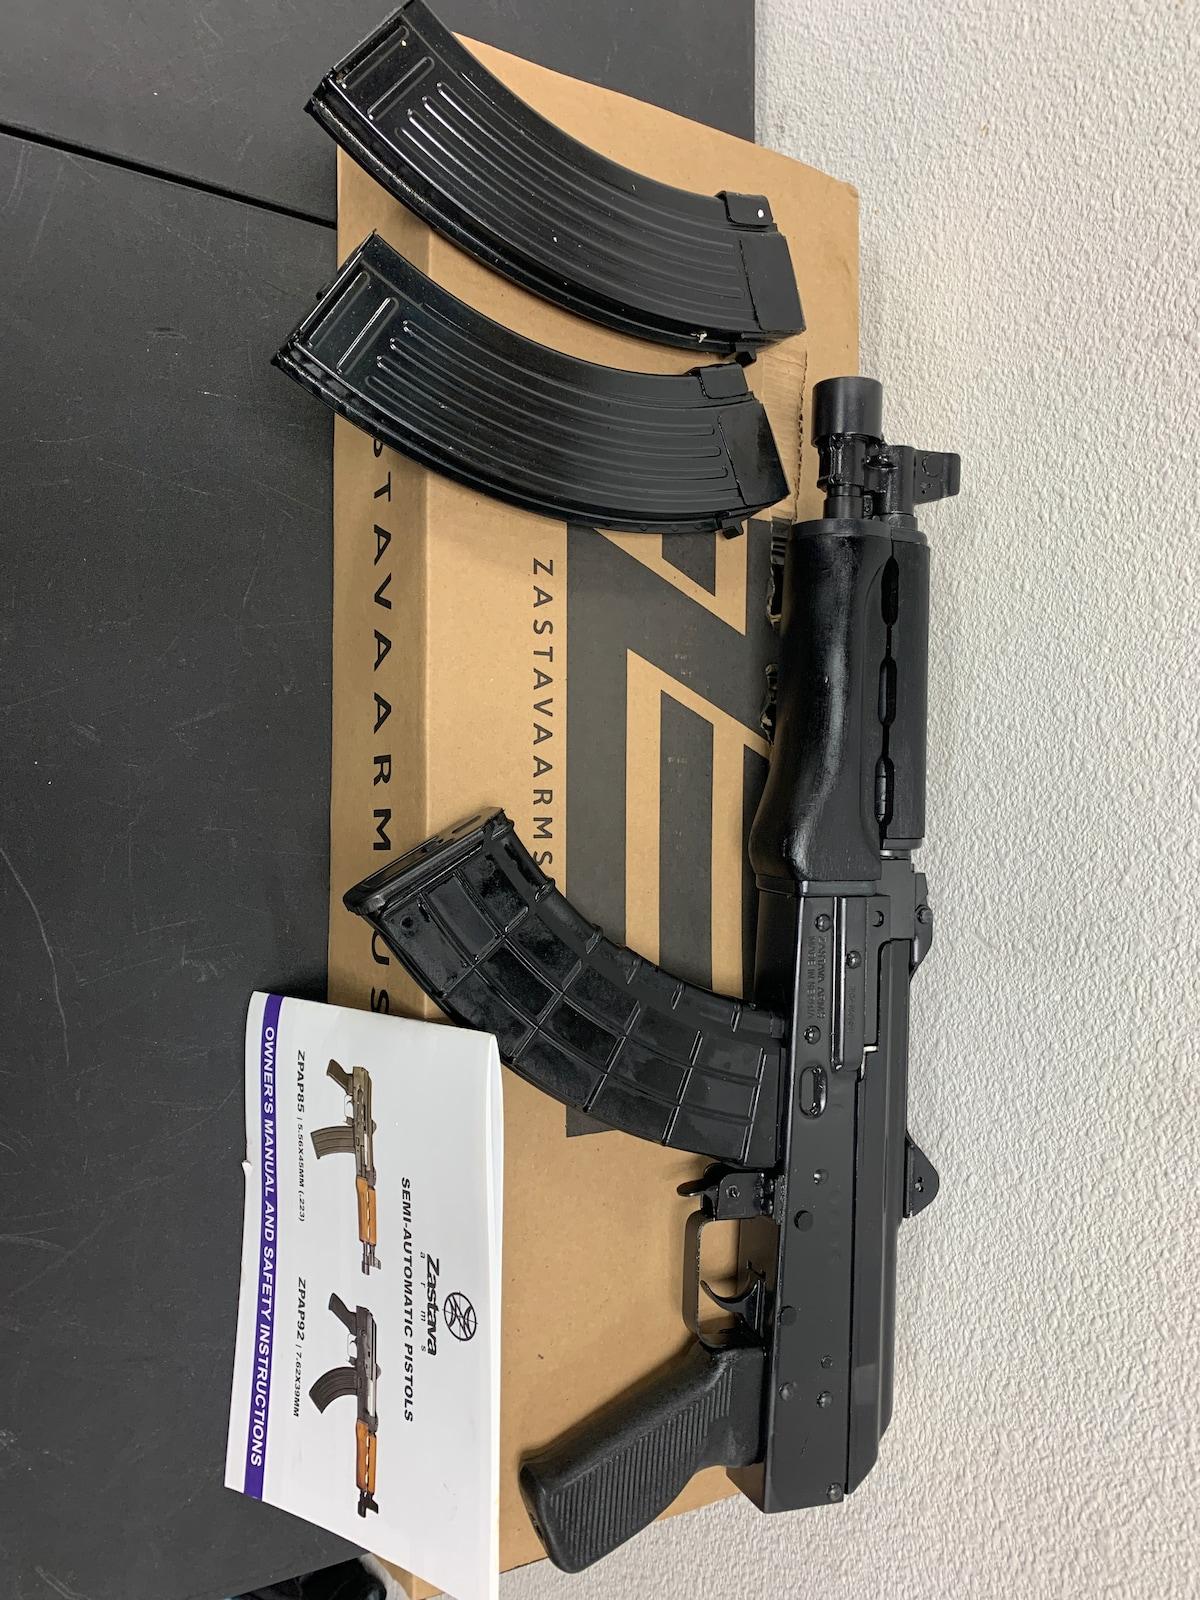 ZASTAVA ARMS ZPAP92 zp92762m 3 mags